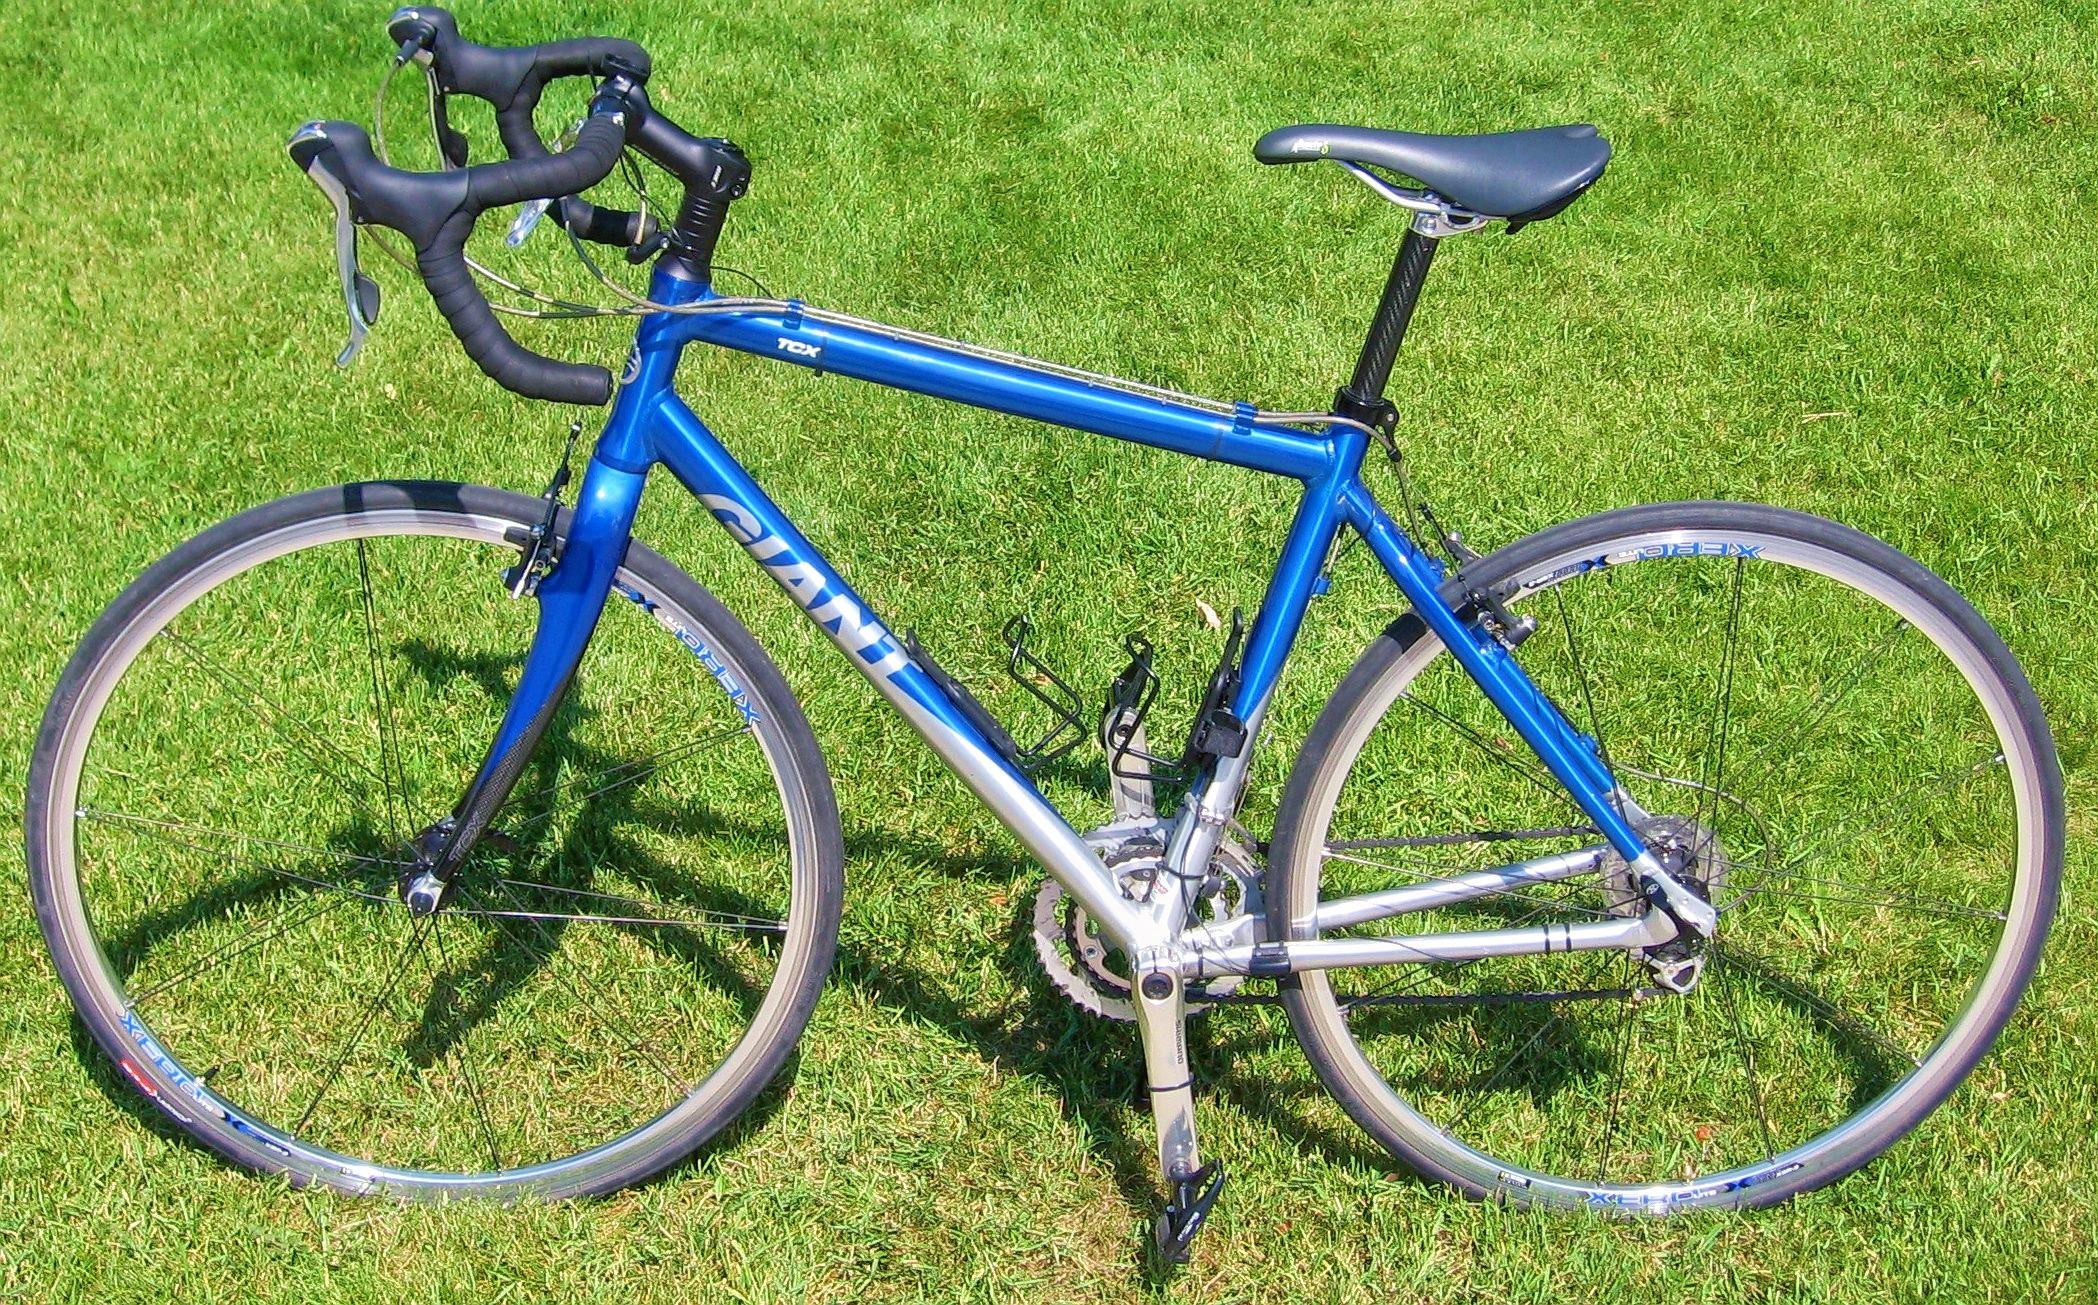 Giant_tcx_cyclocross.jpg